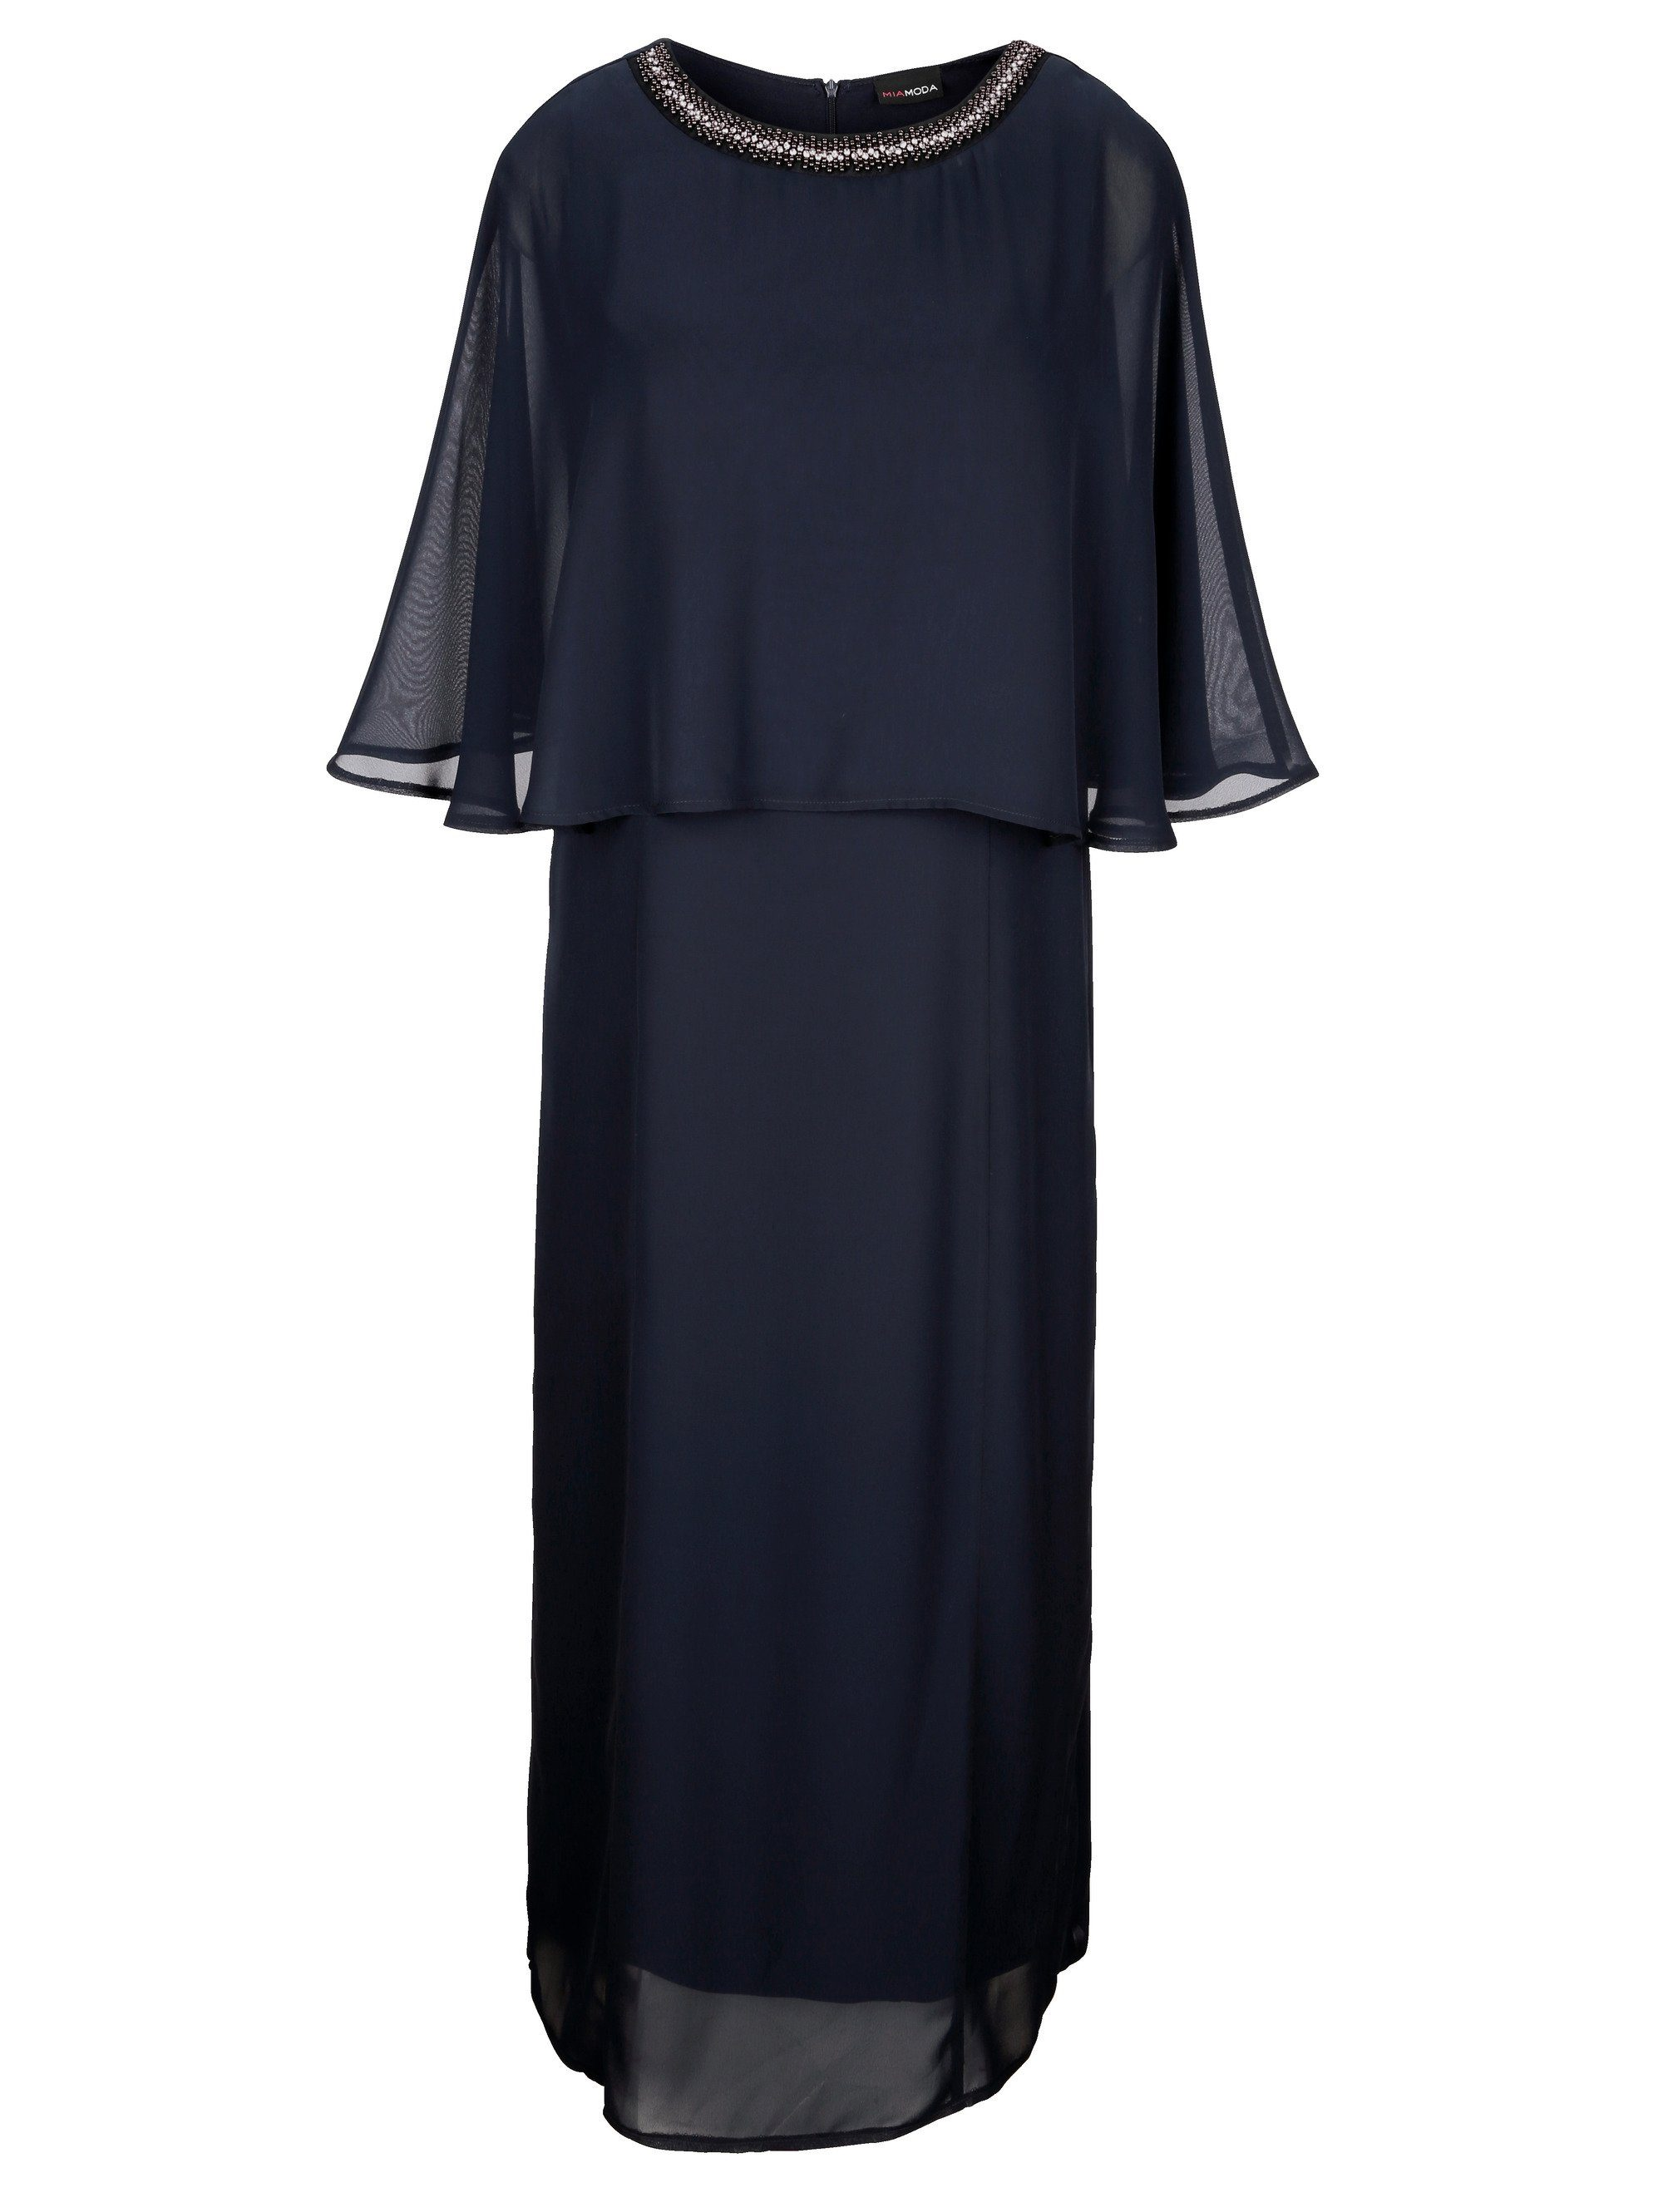 MIAMODA Kleid in festlicher Maxilänge